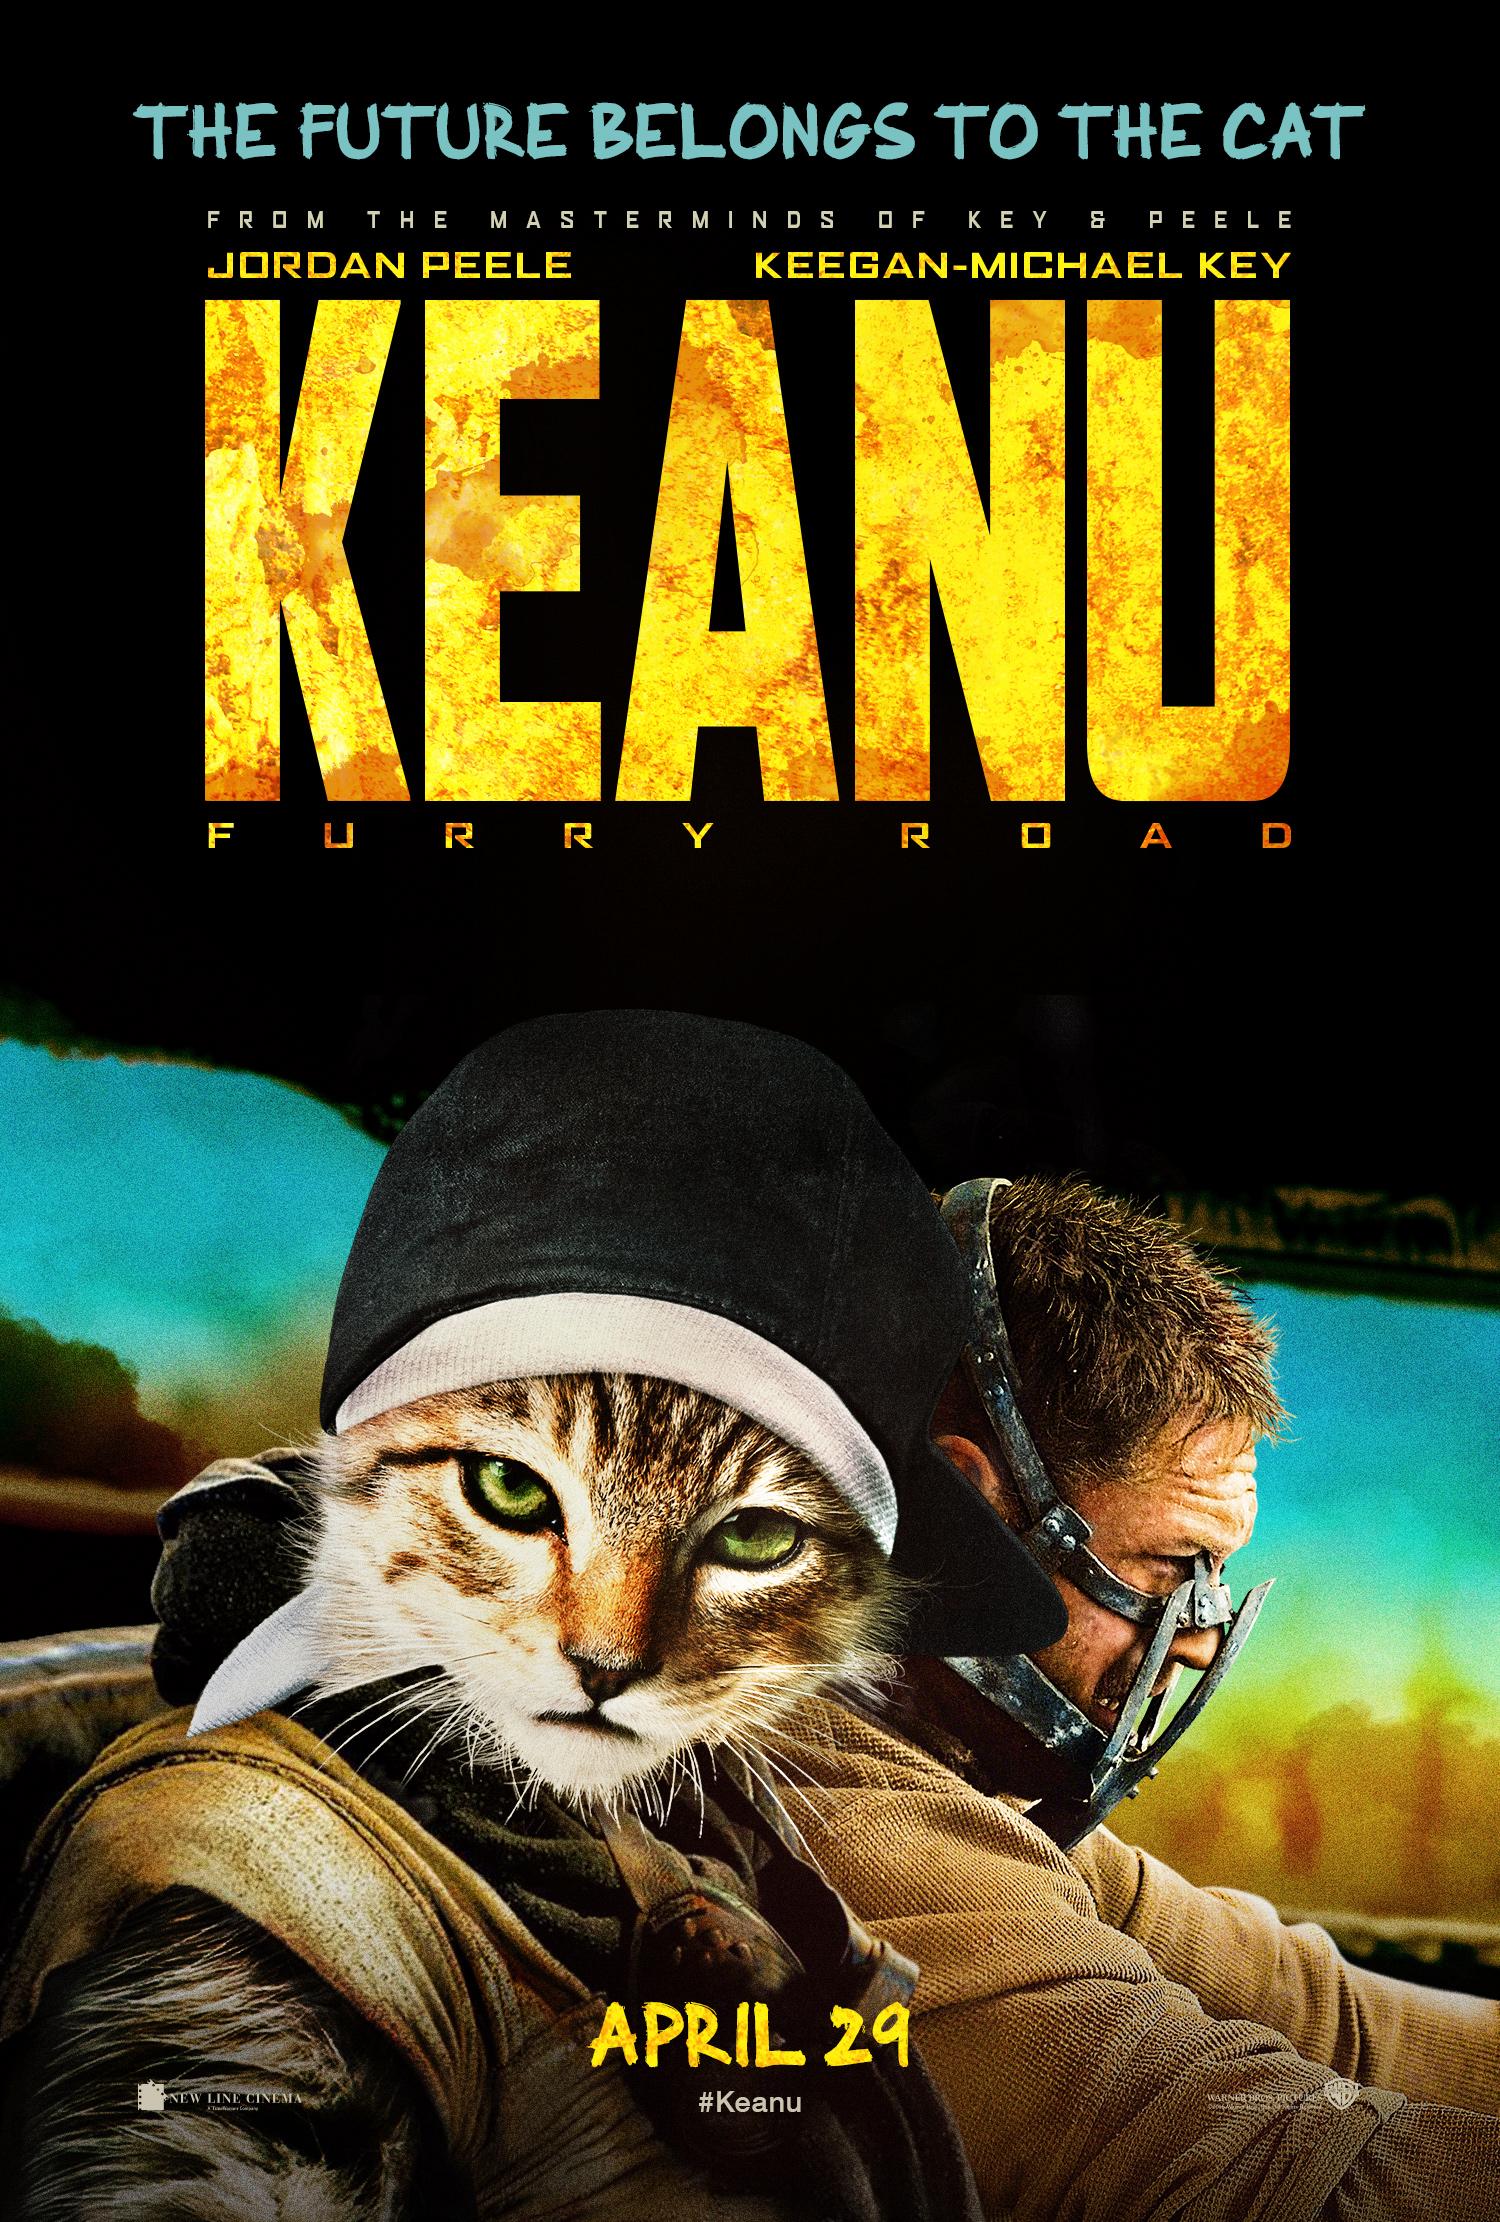 KEANU_OSCARS_MAD_MAX_master